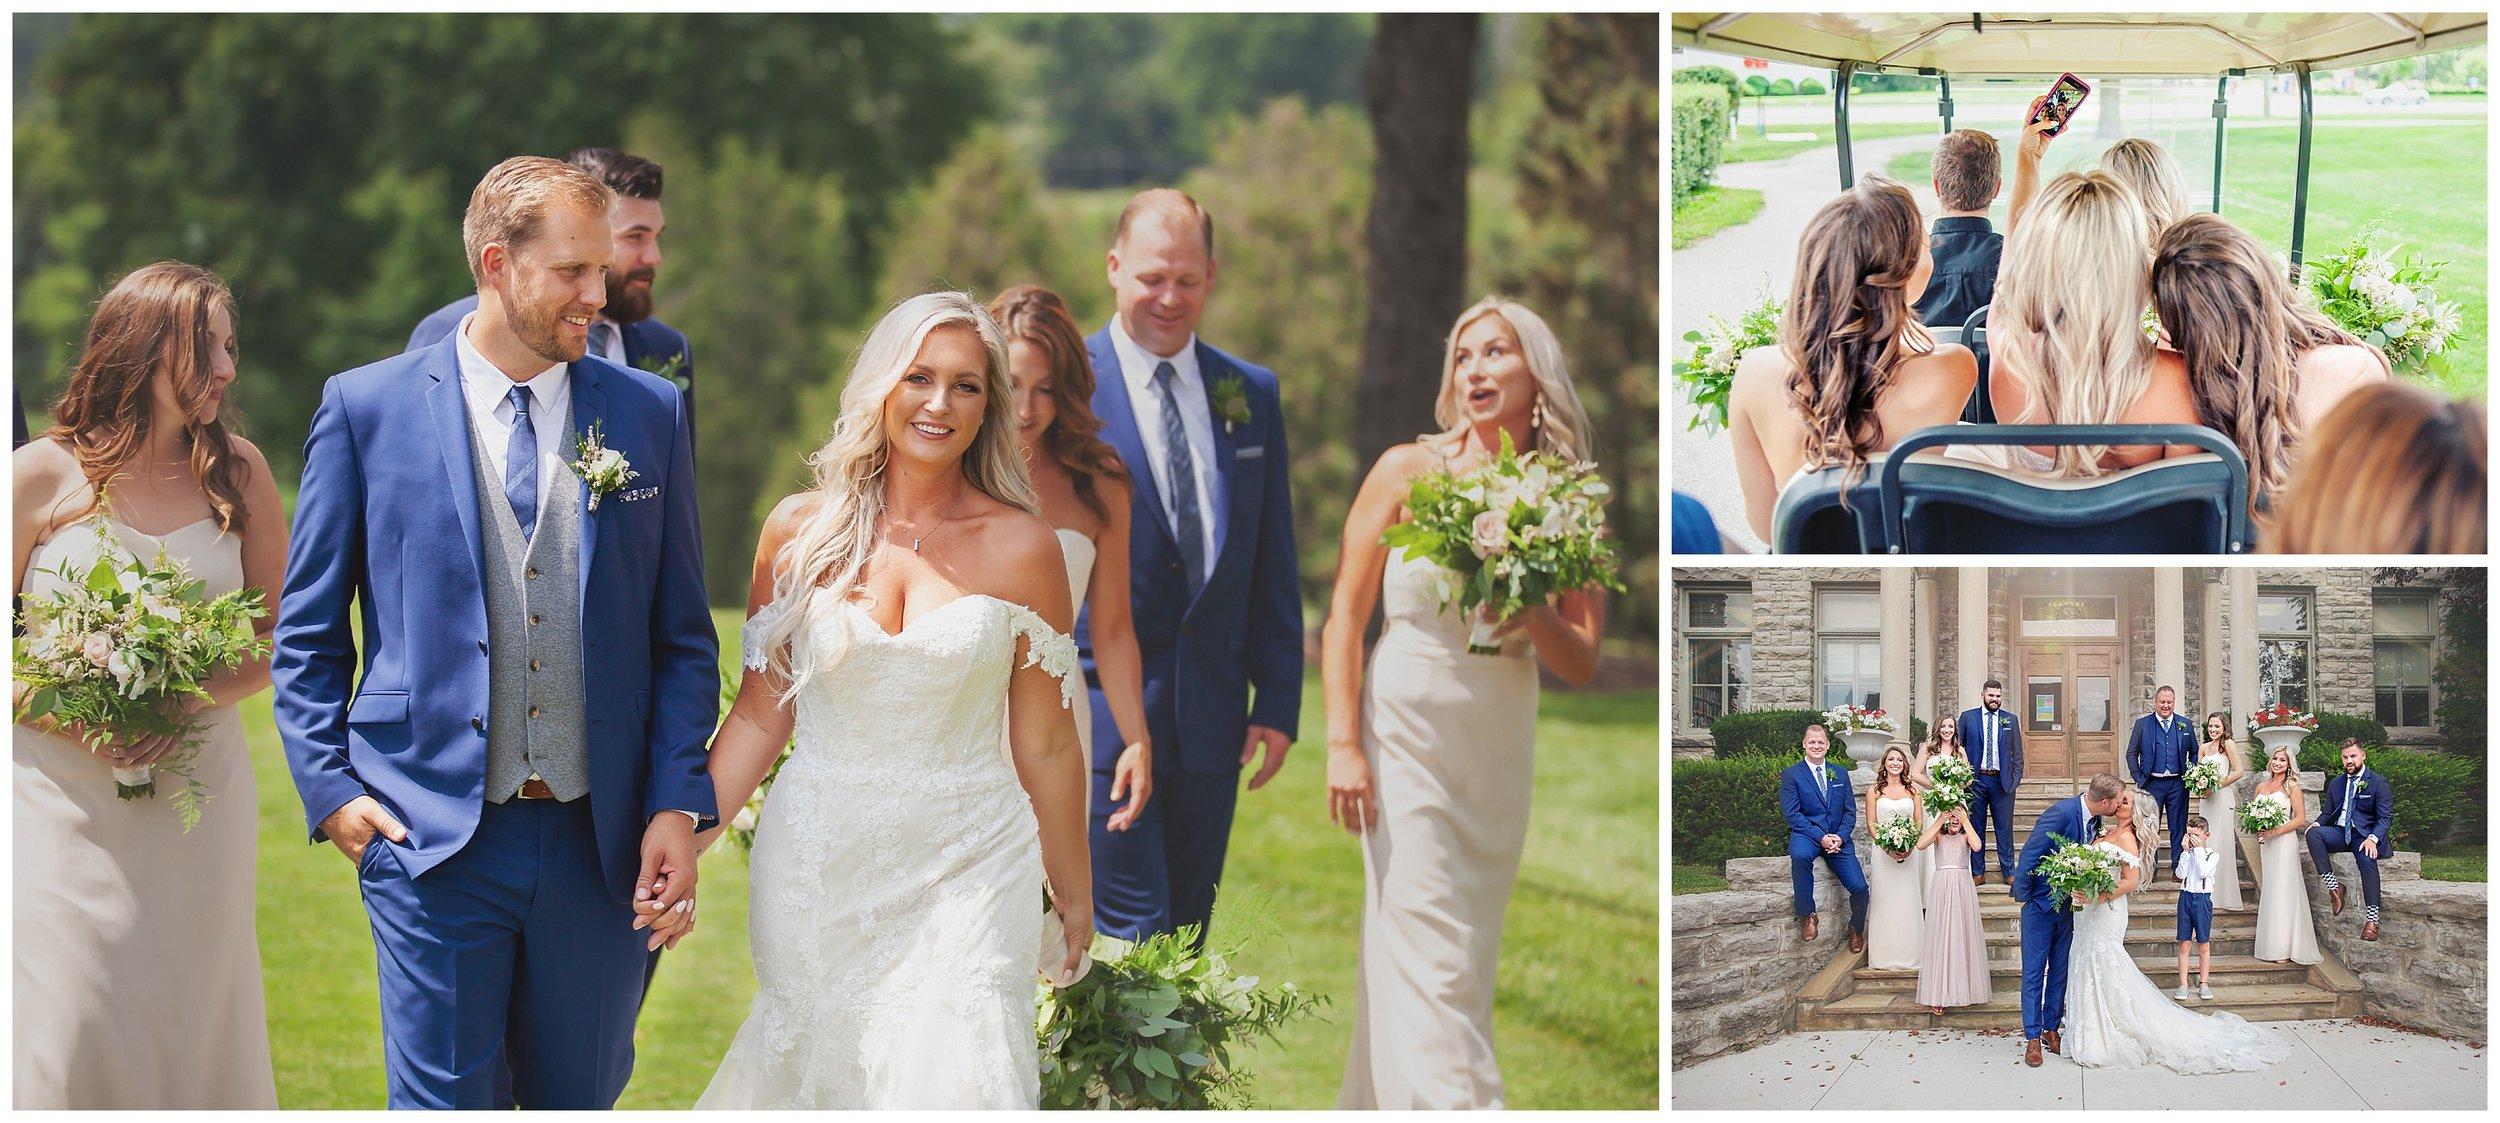 VanDaele-Russell-Wedding-Photography-London-Toronto-Ontario_0173.jpg